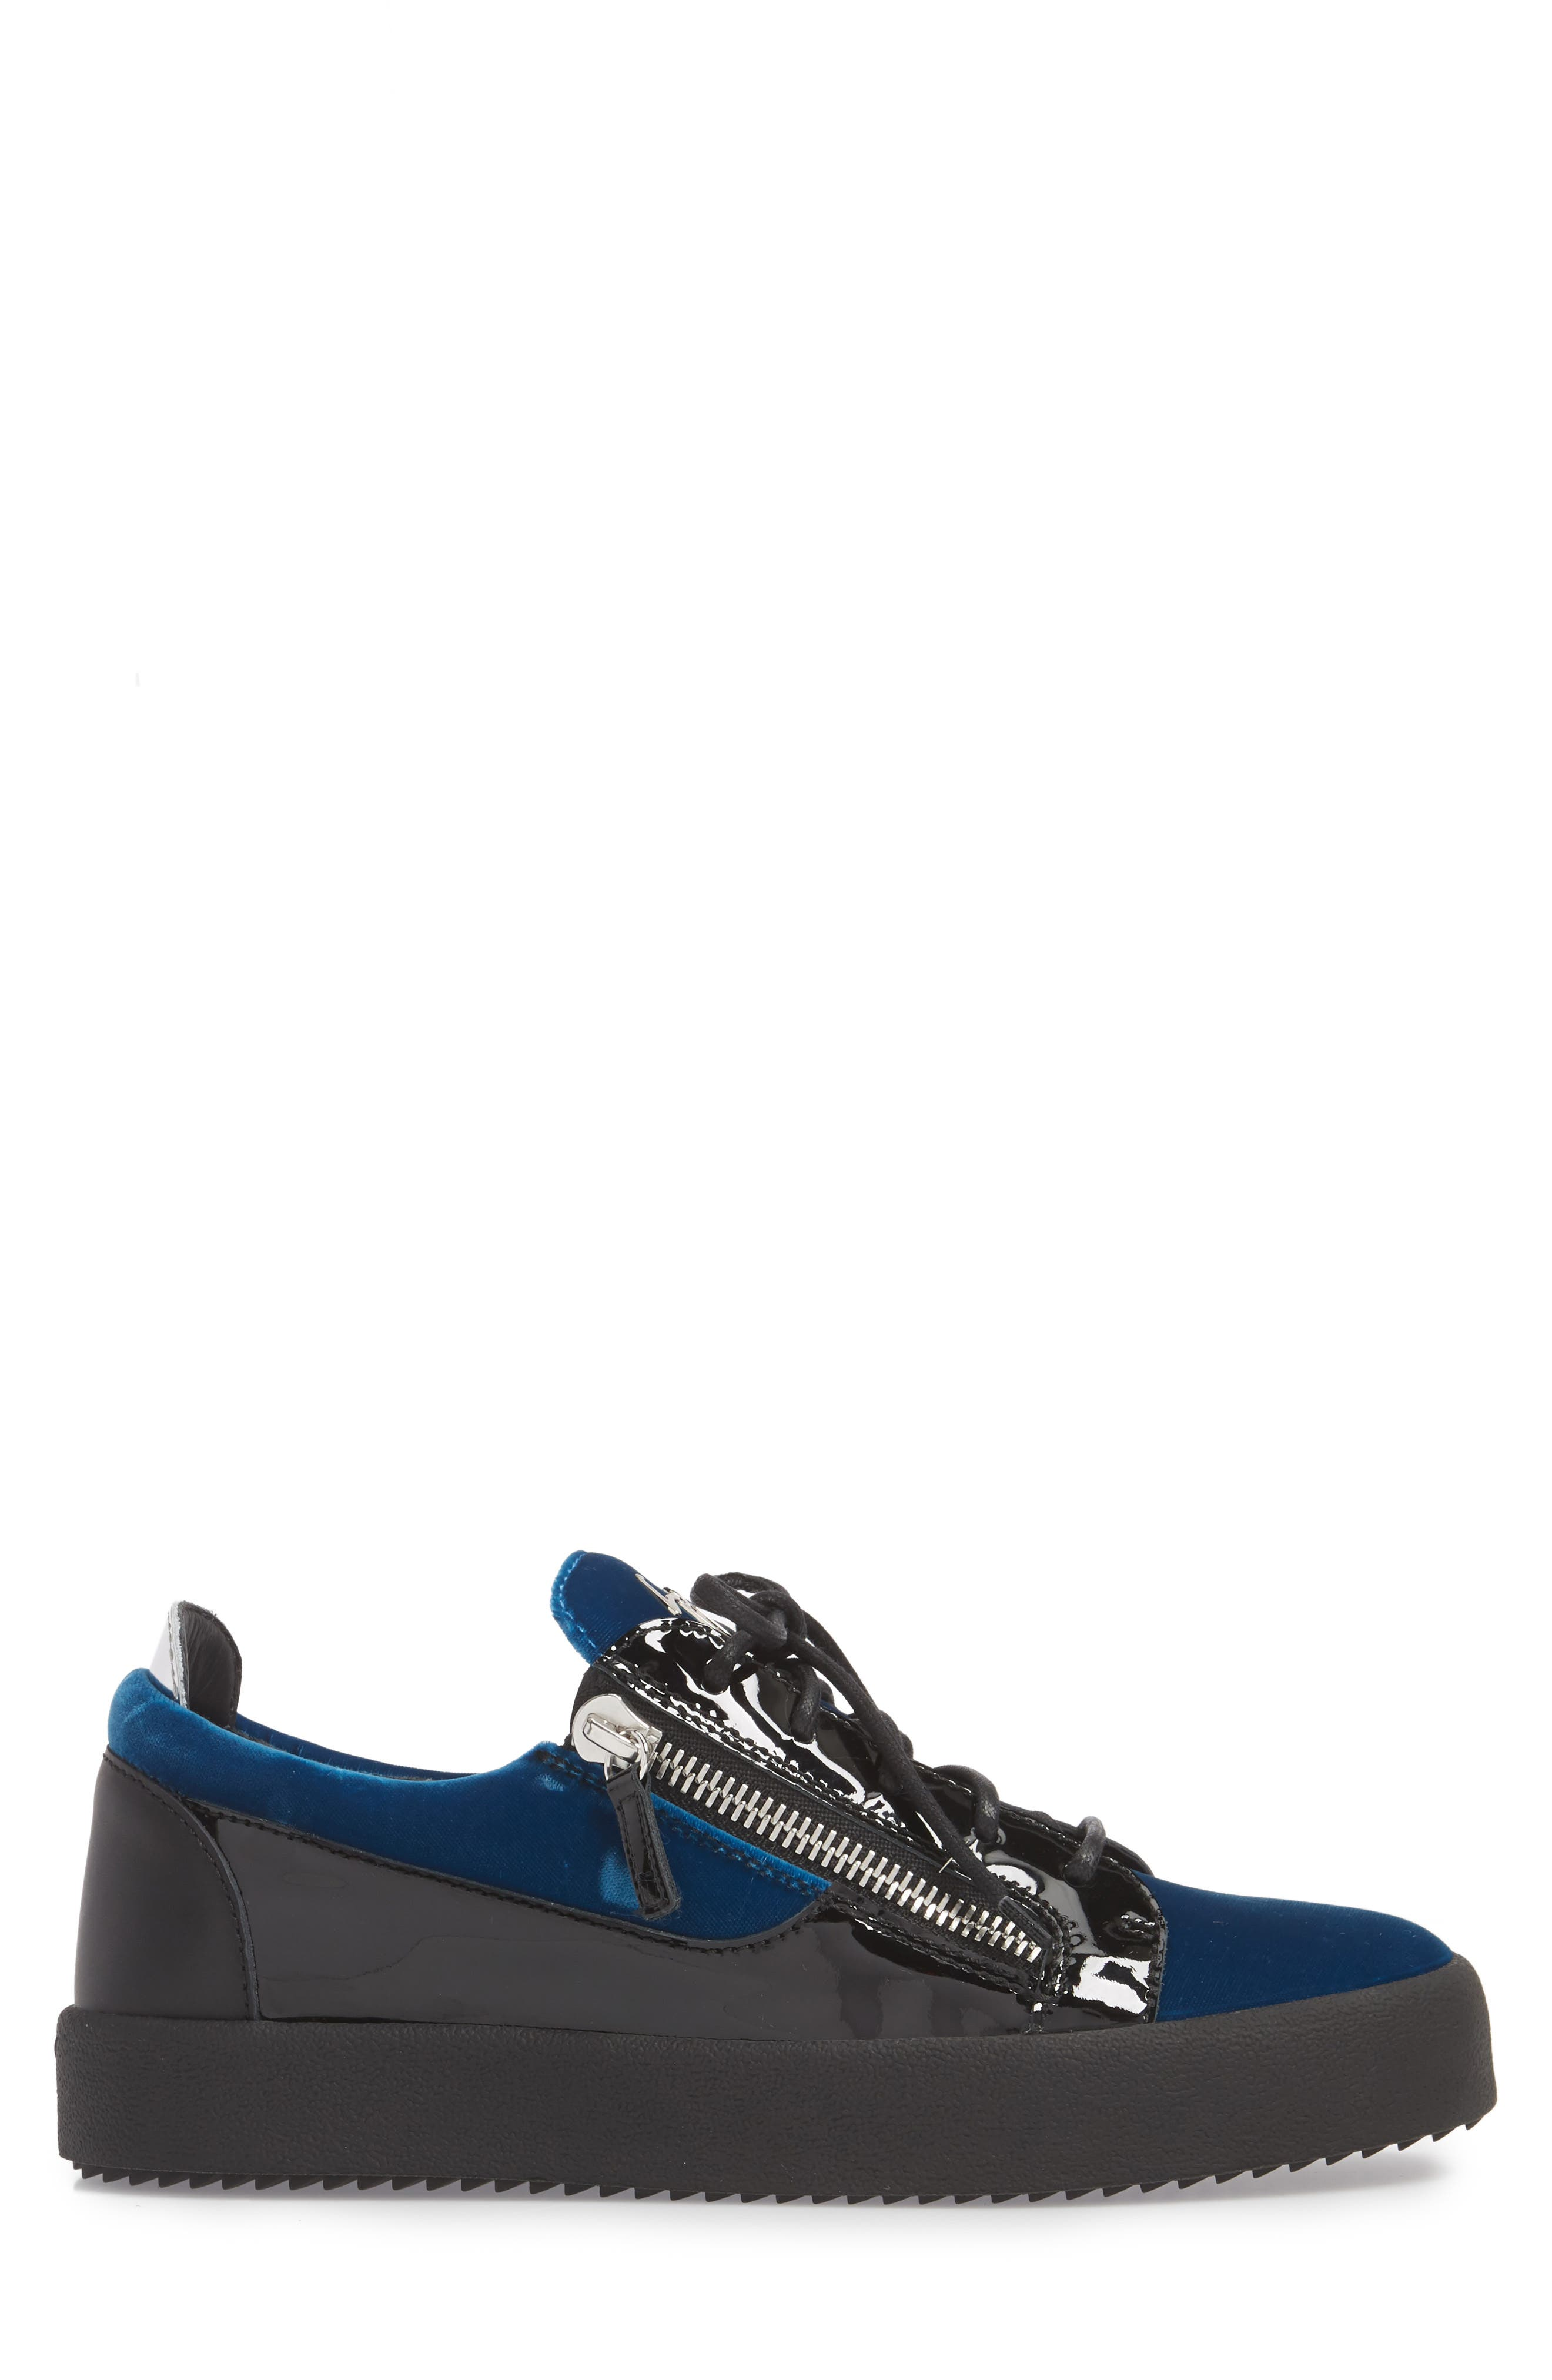 Camo Sneaker,                             Alternate thumbnail 3, color,                             BLUE